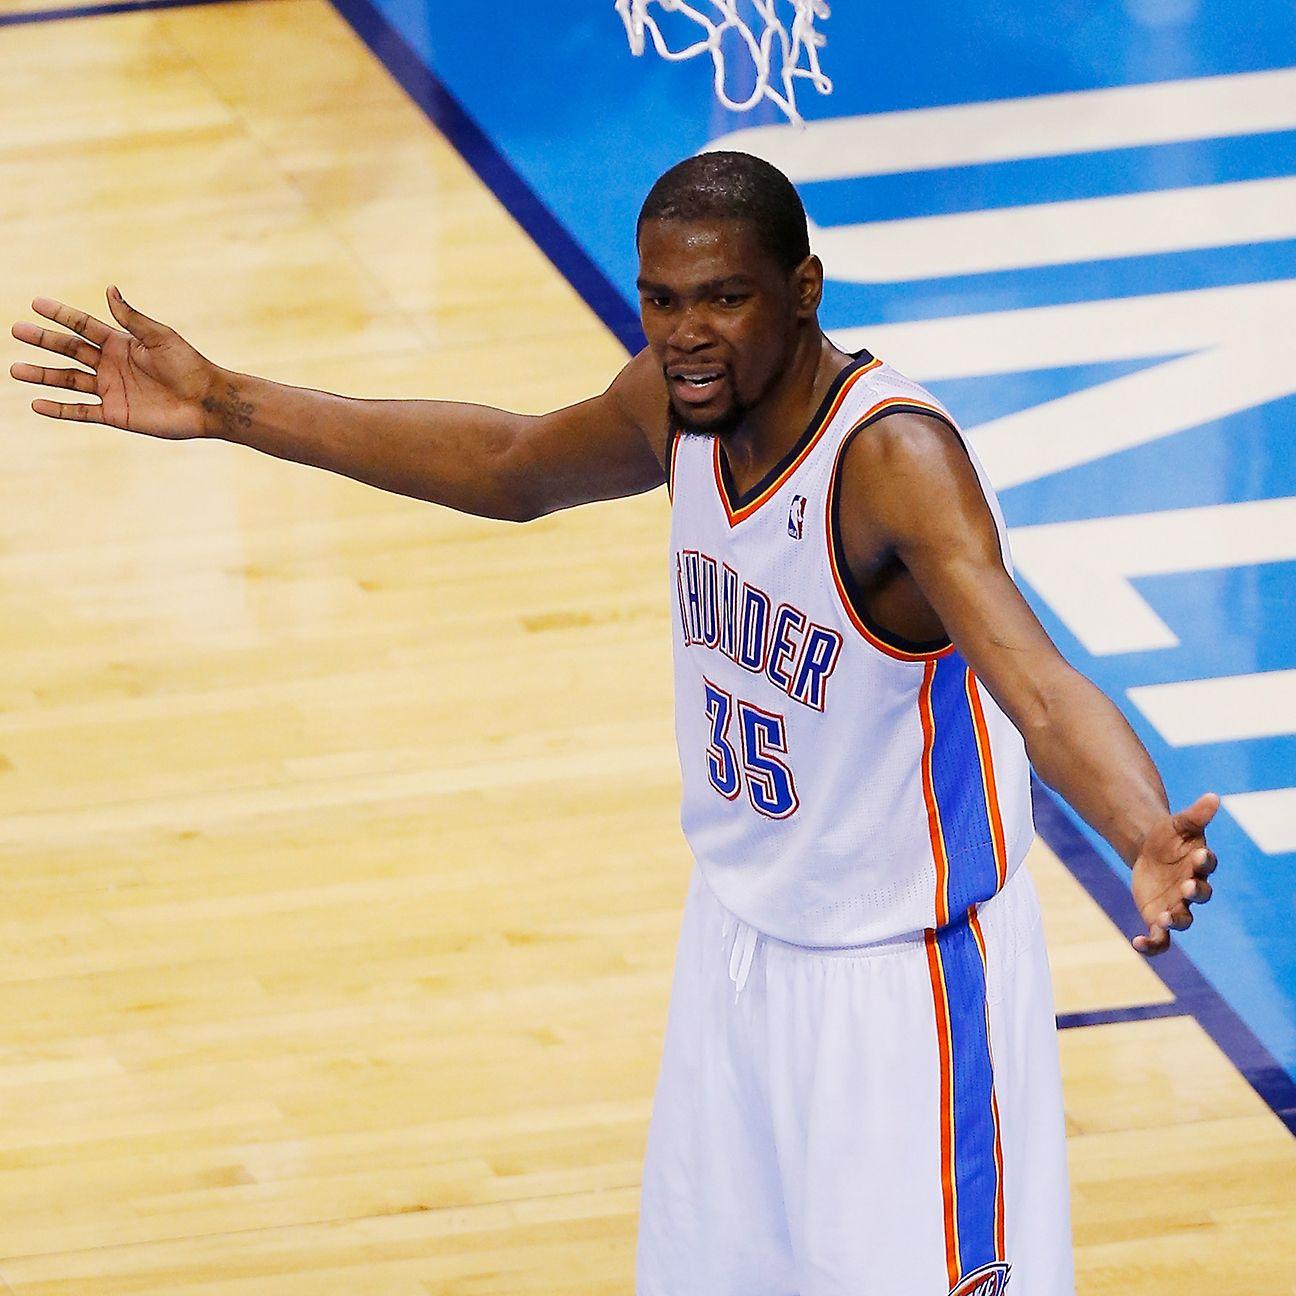 Kevin Durant has room for improvement - TrueHoop - ESPN